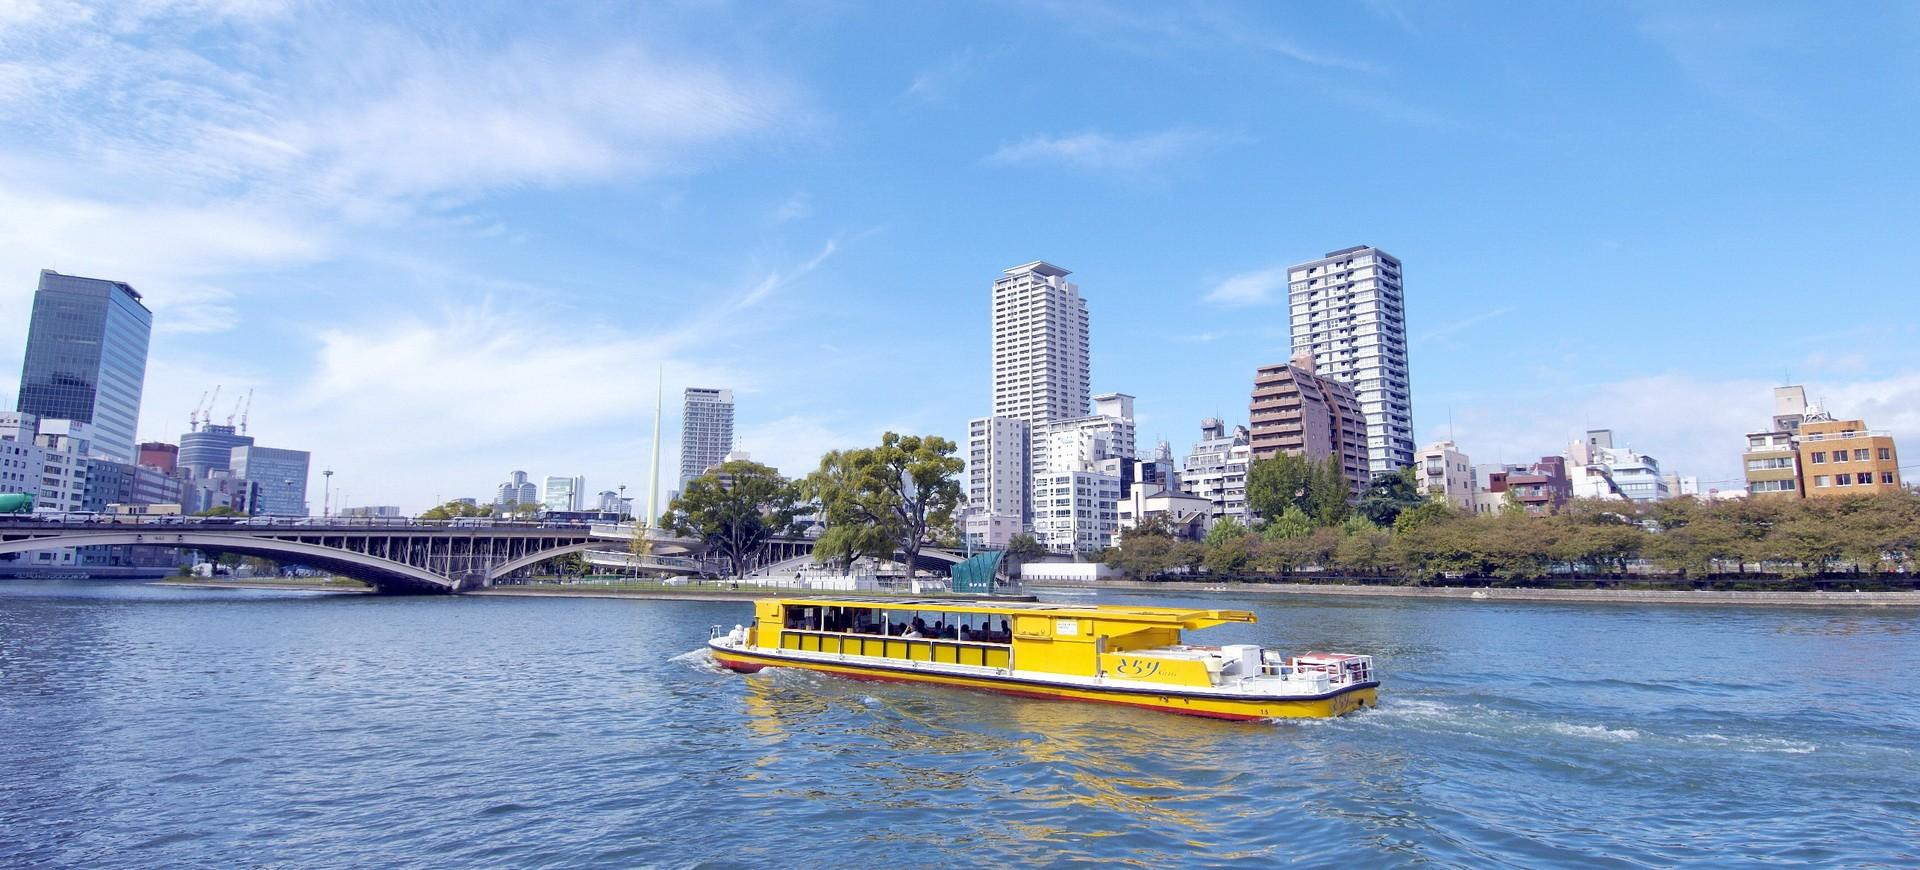 Japon Osaka Nakanoshima